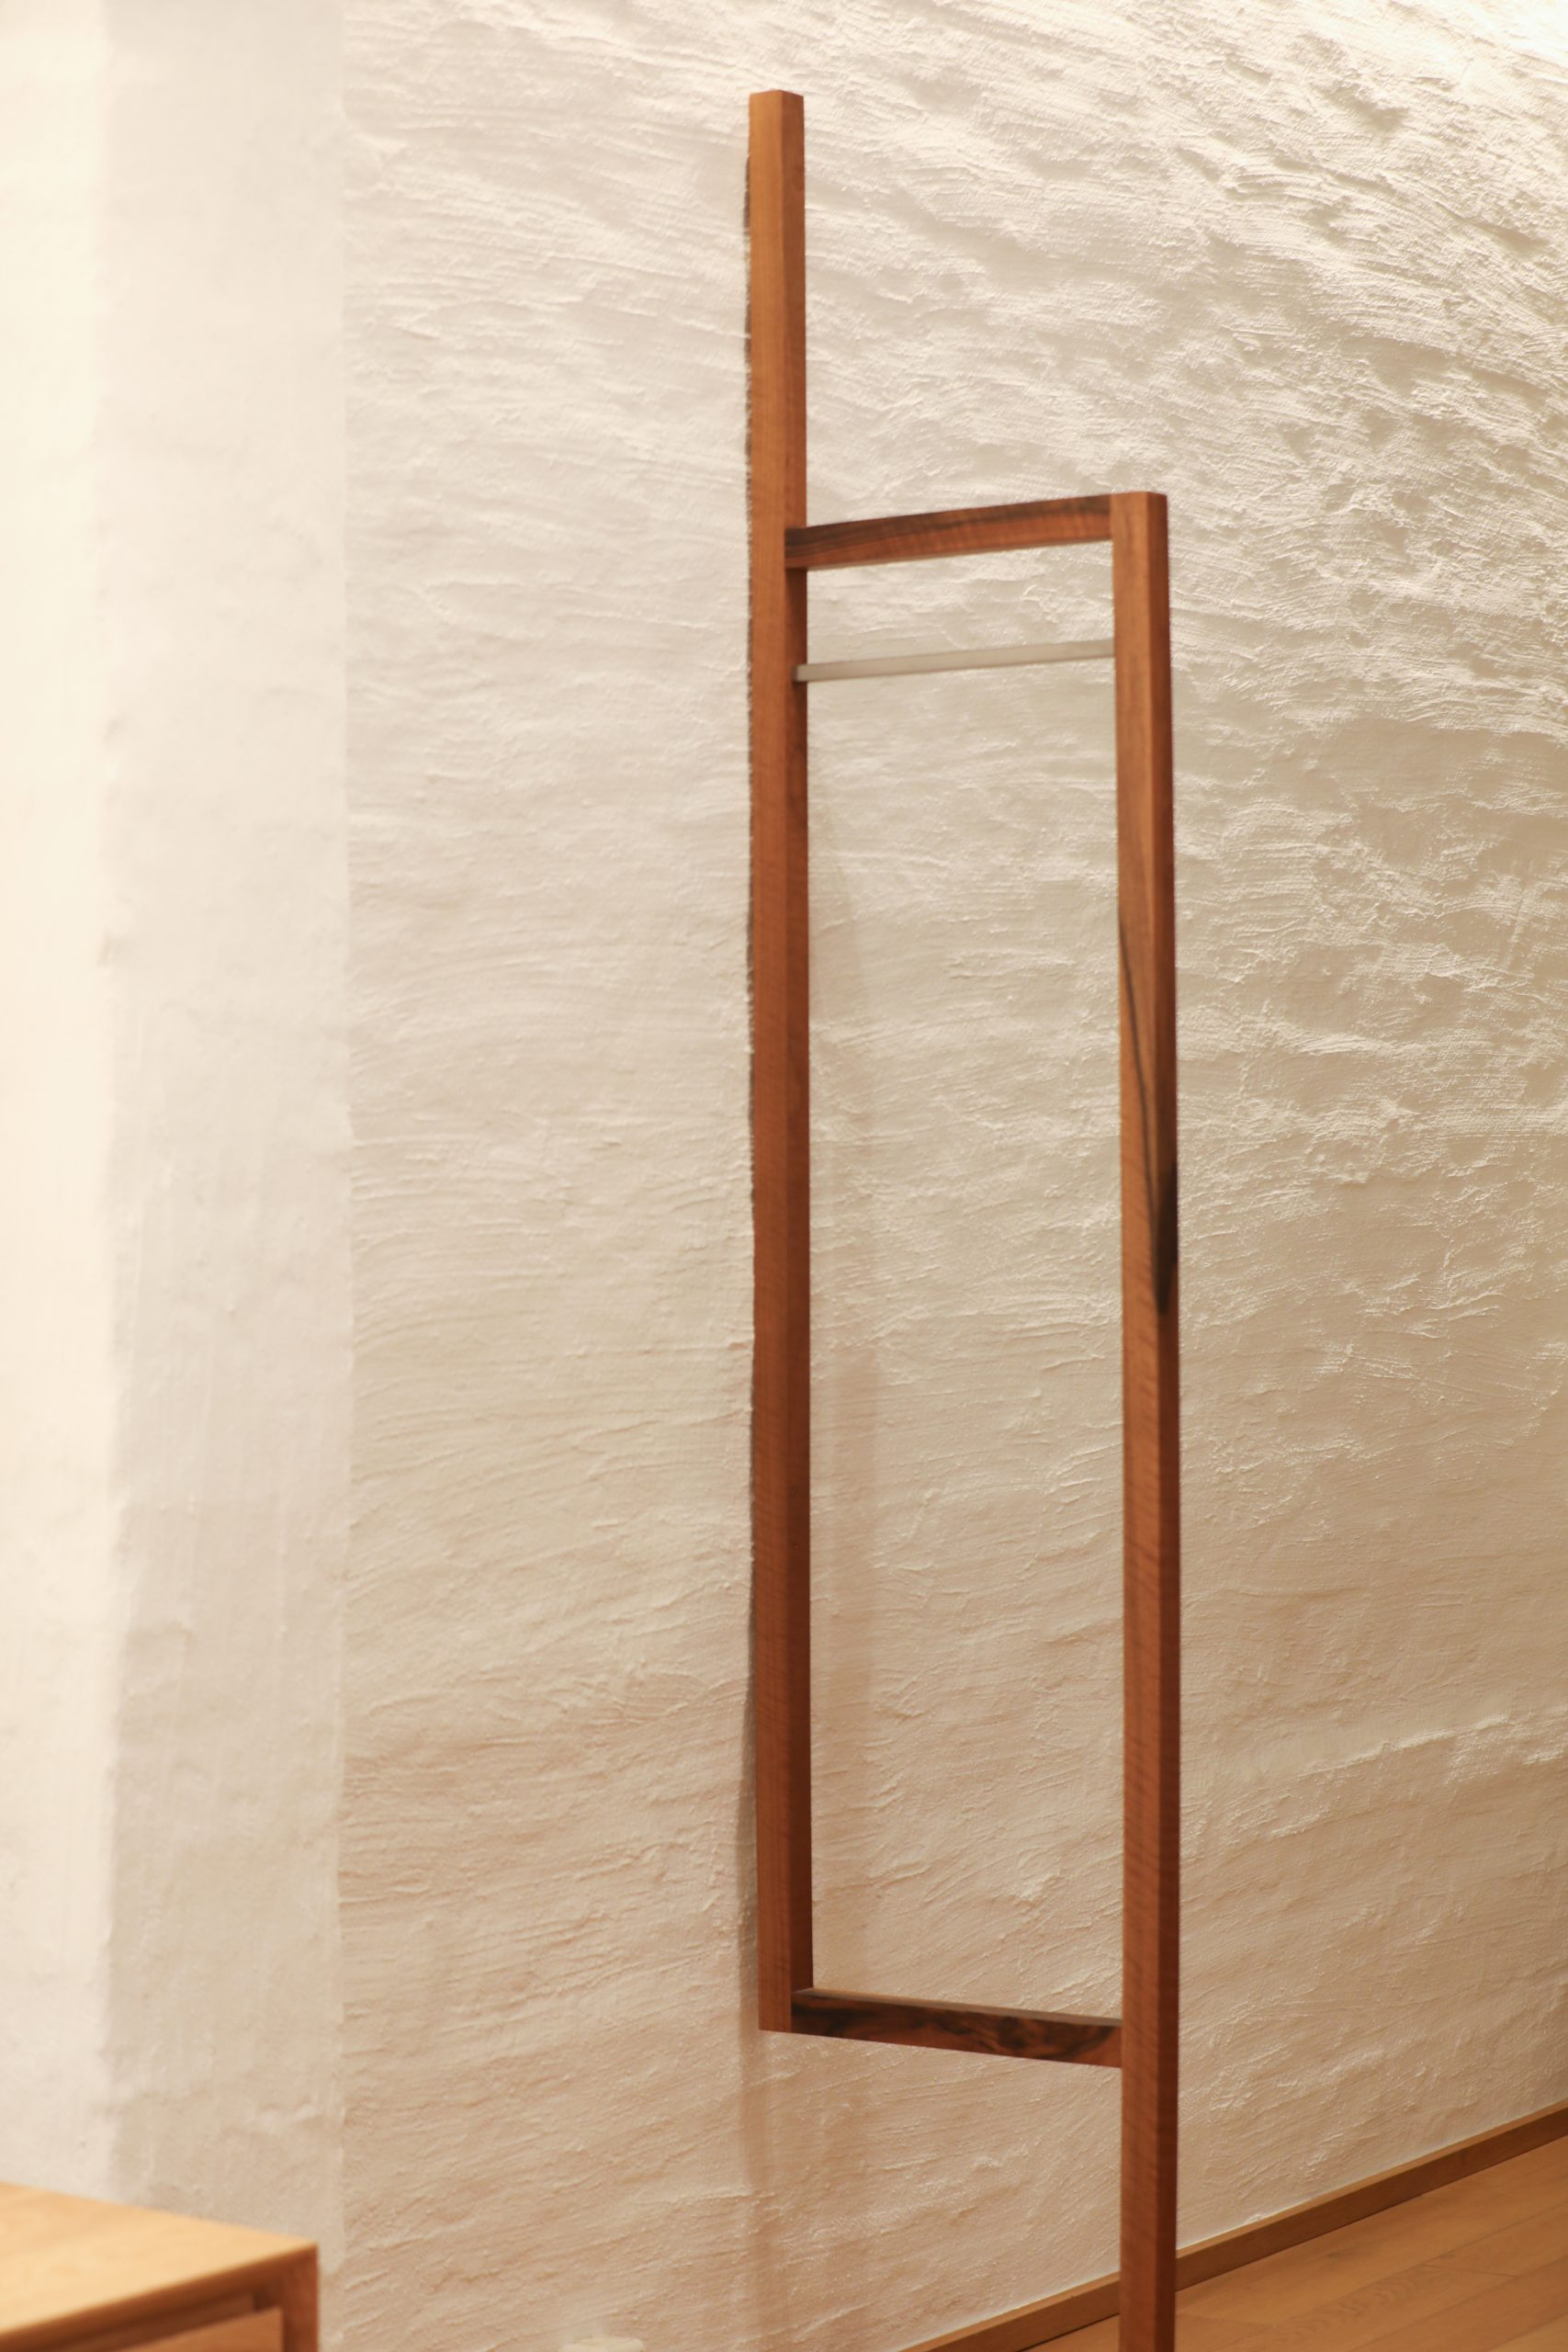 Made-in-Taunus-accessoires-Garderobe-Helena-20